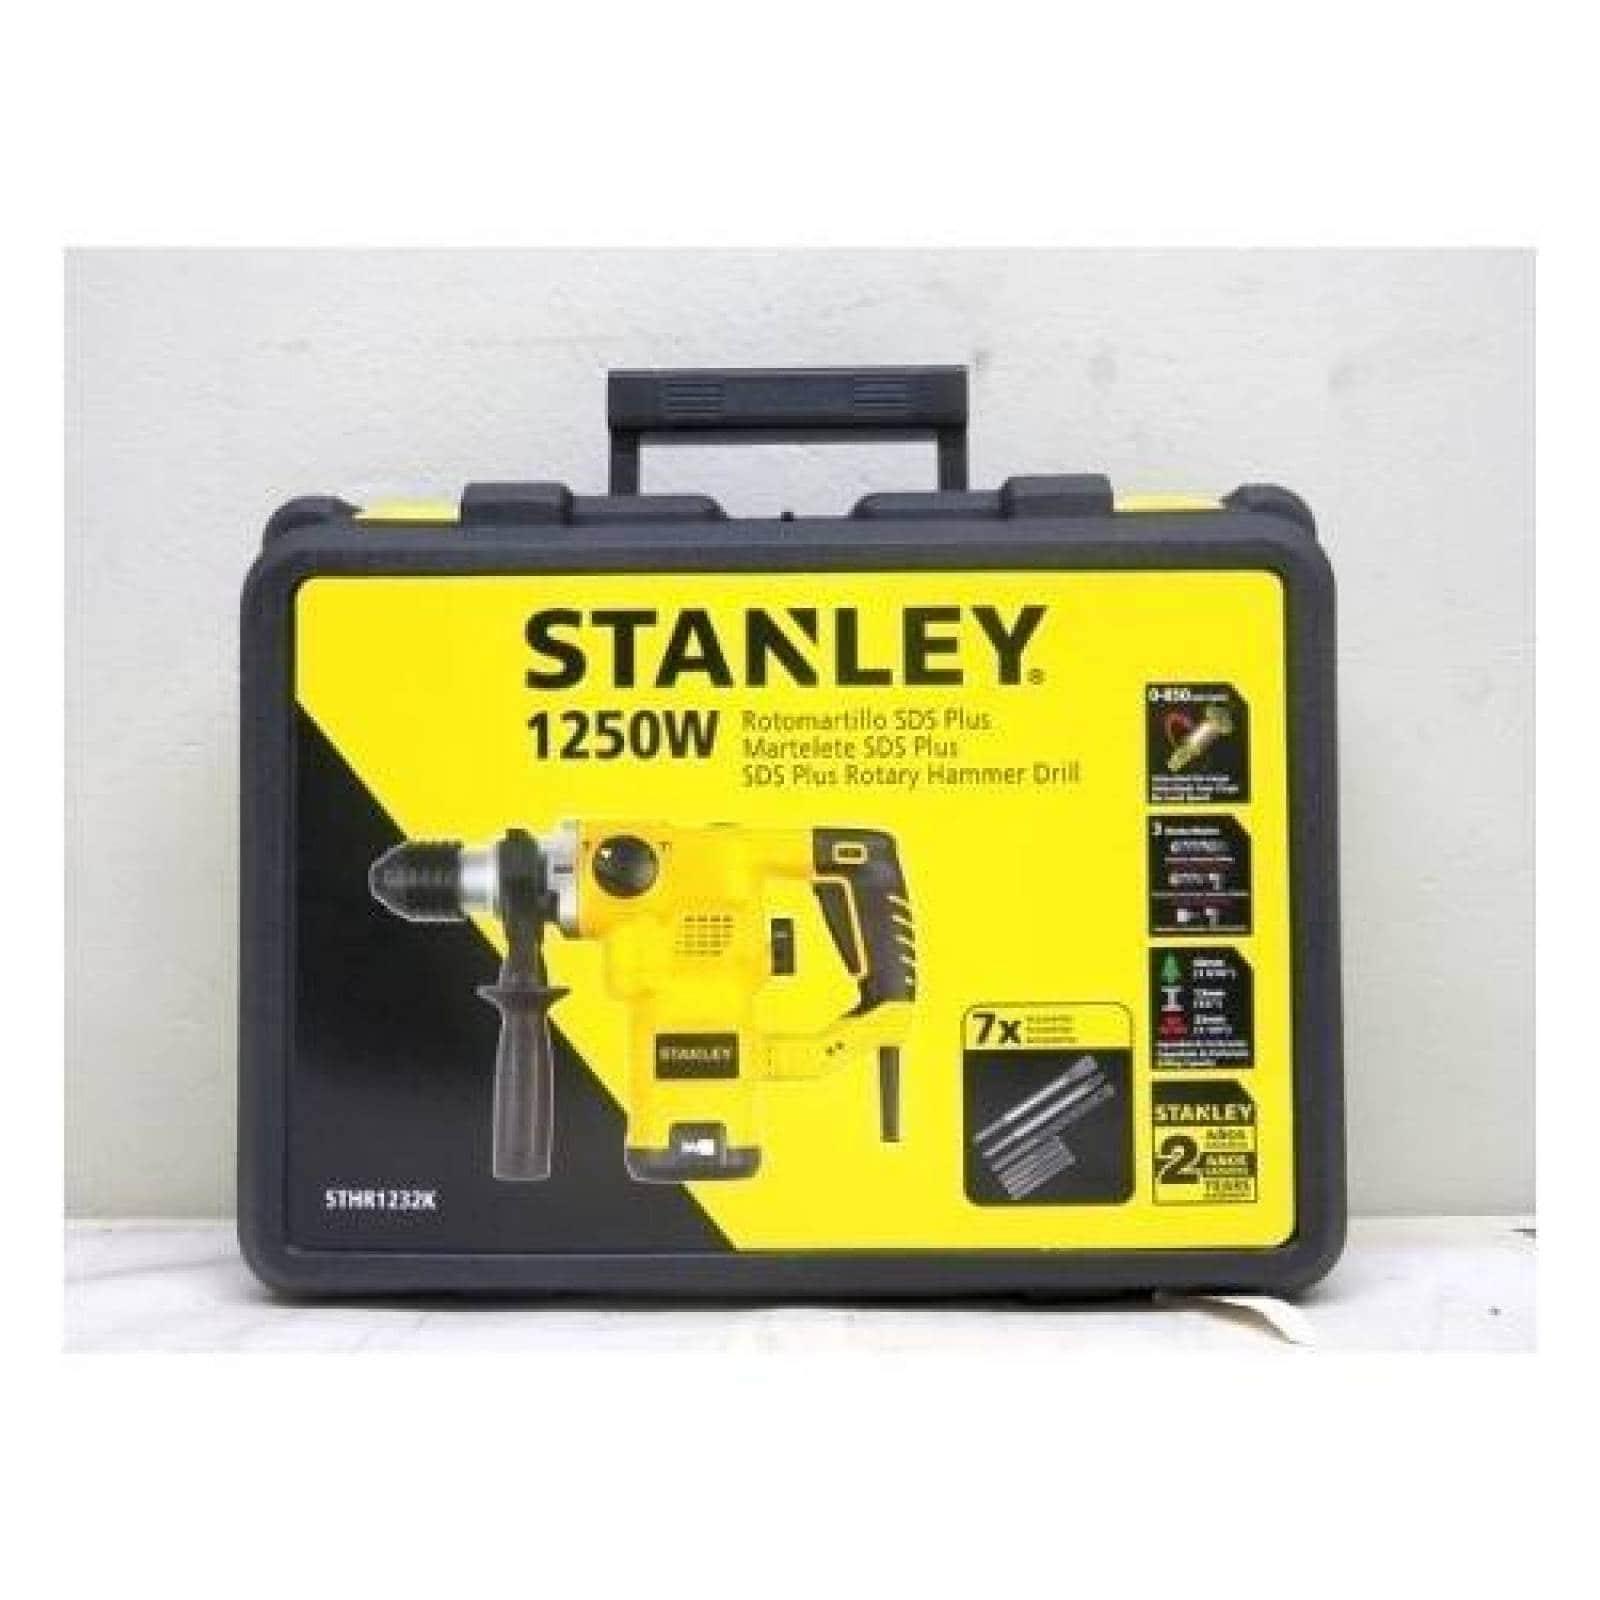 Rotomartillo Sds plus  1200w 1 1 4 Stanley Sthr1232k b3